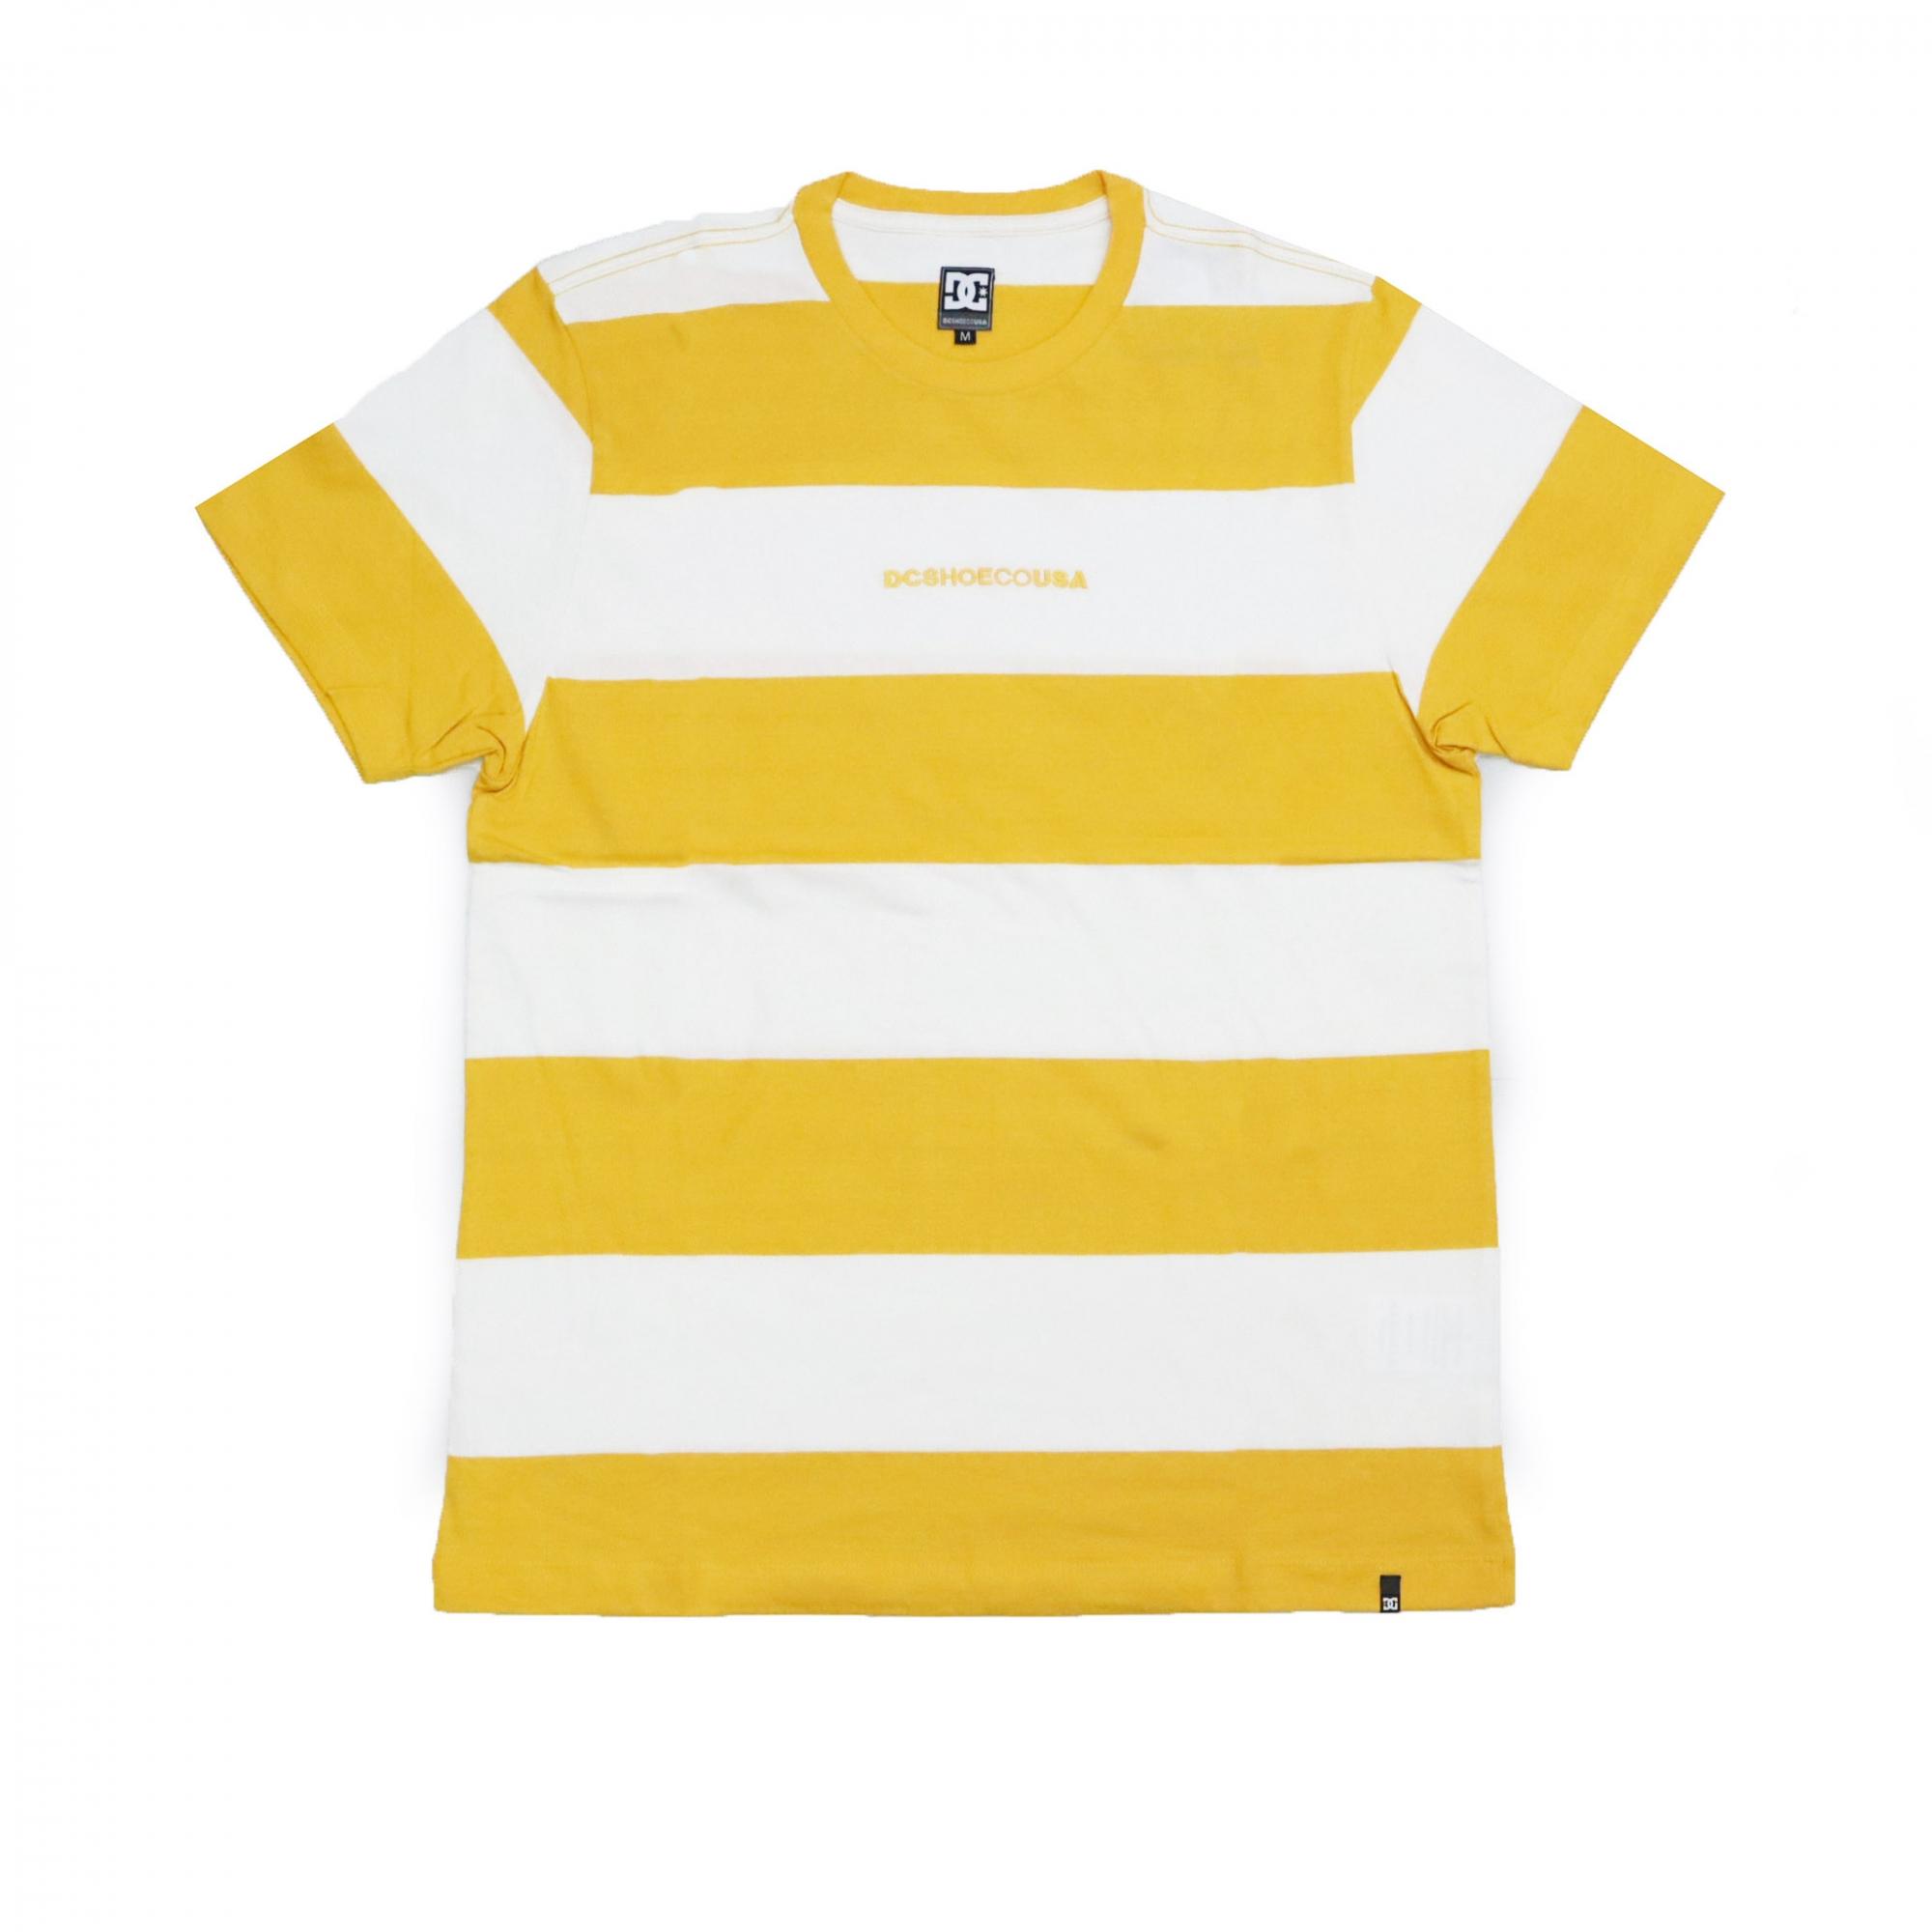 Camiseta DC Shoes Uptown Stripe - Amarelo/Off White